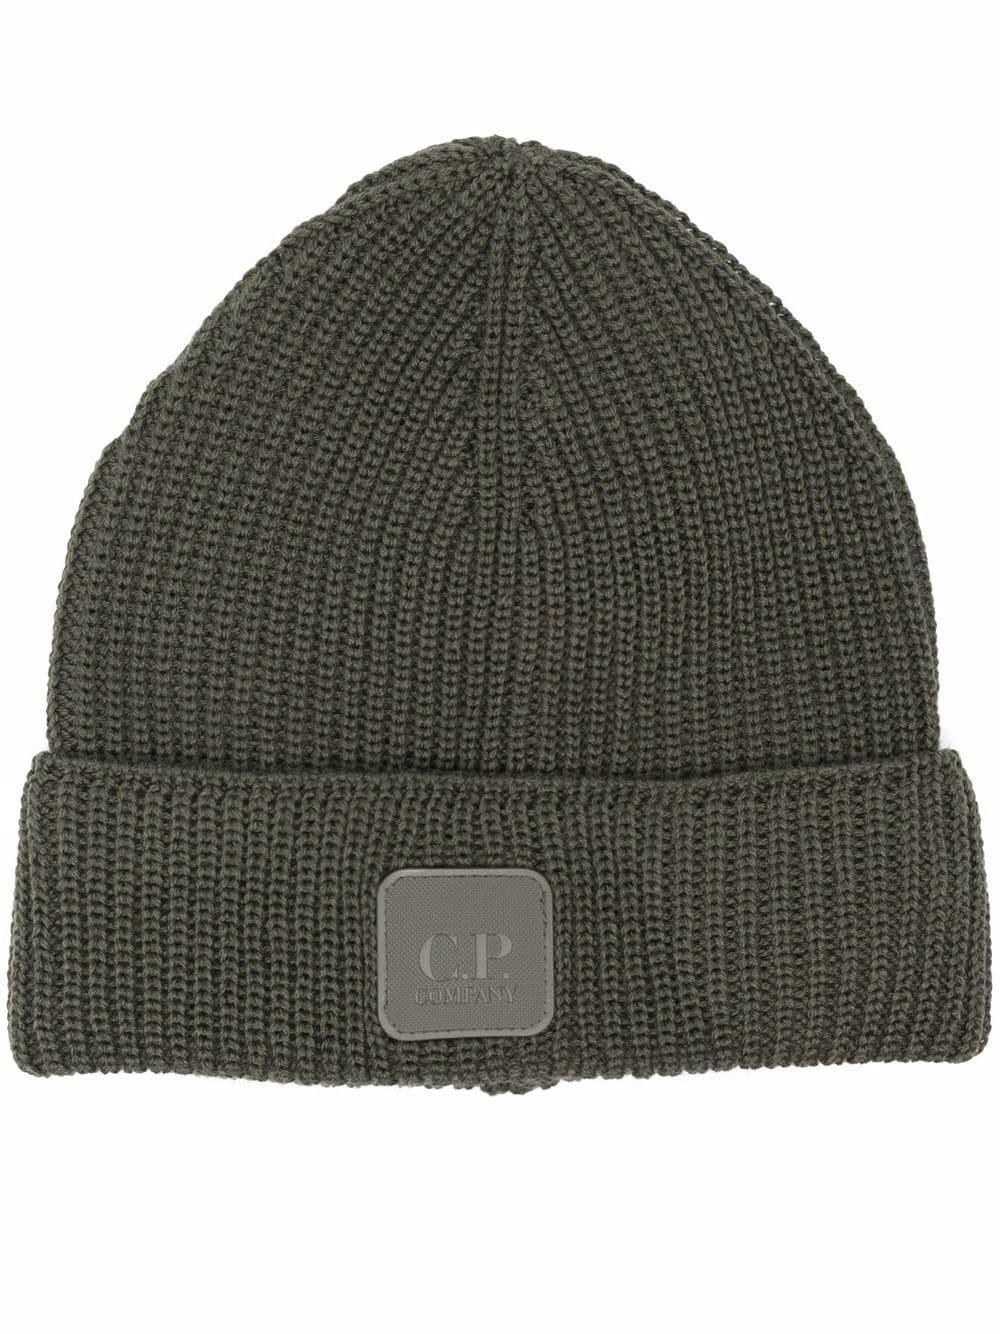 wool hat man gray C.P. COMPANY | Hats | 11CMAC121A005509A665